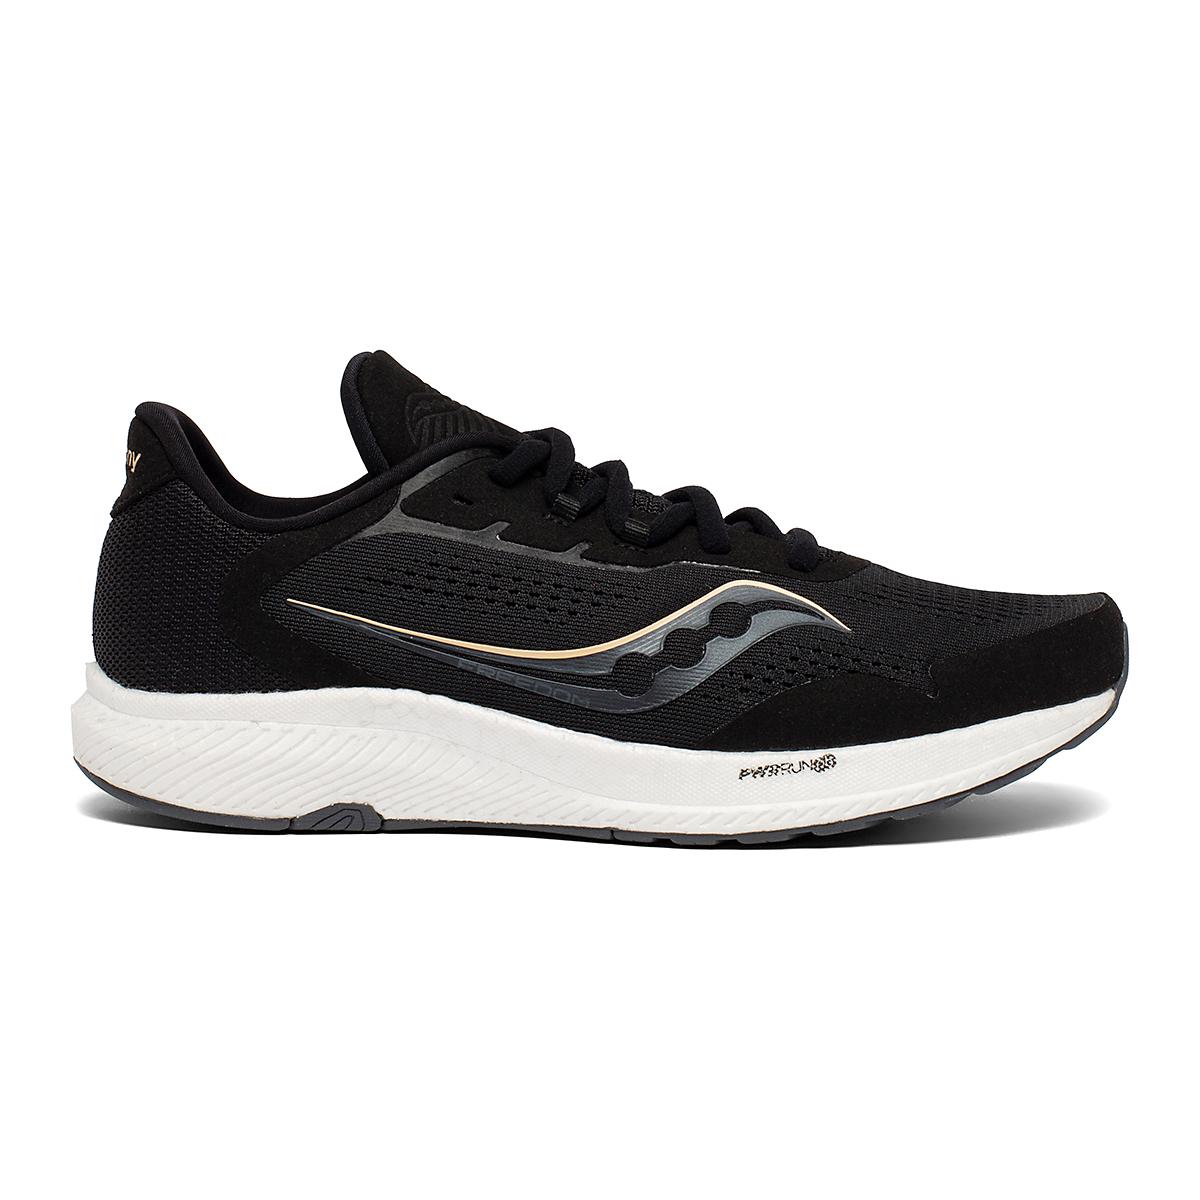 Women's Saucony Freedom 4 Running Shoe - Color: Black/Sunset - Size: 5 - Width: Regular, Black/Sunset, large, image 1